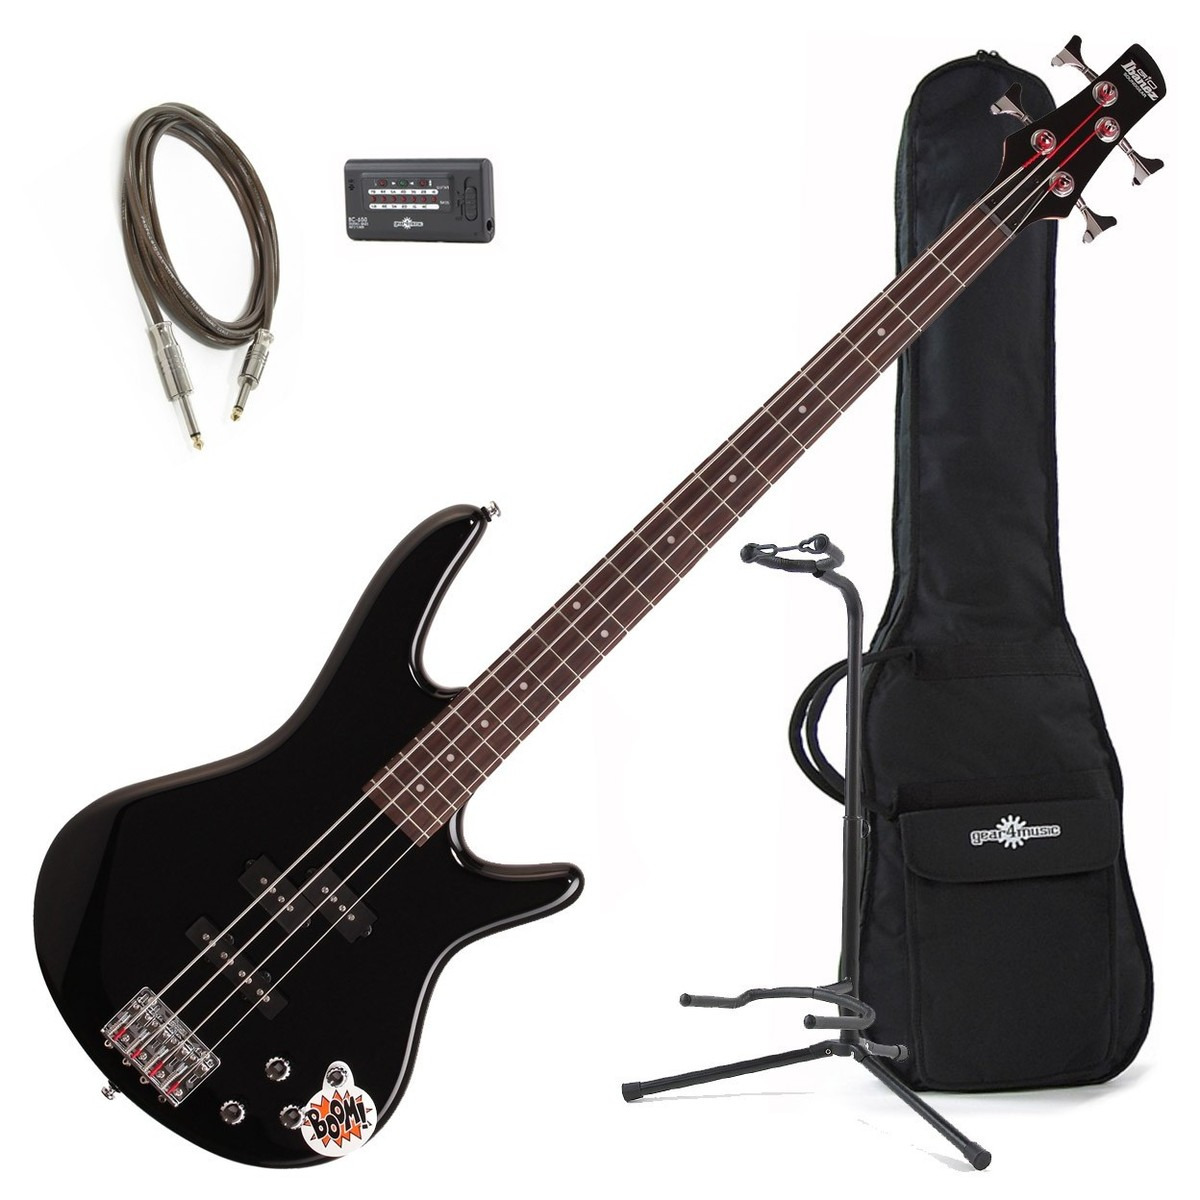 Ibanez GSR200 Gio Bass Guitar Bundle, Black at Gear4music.com